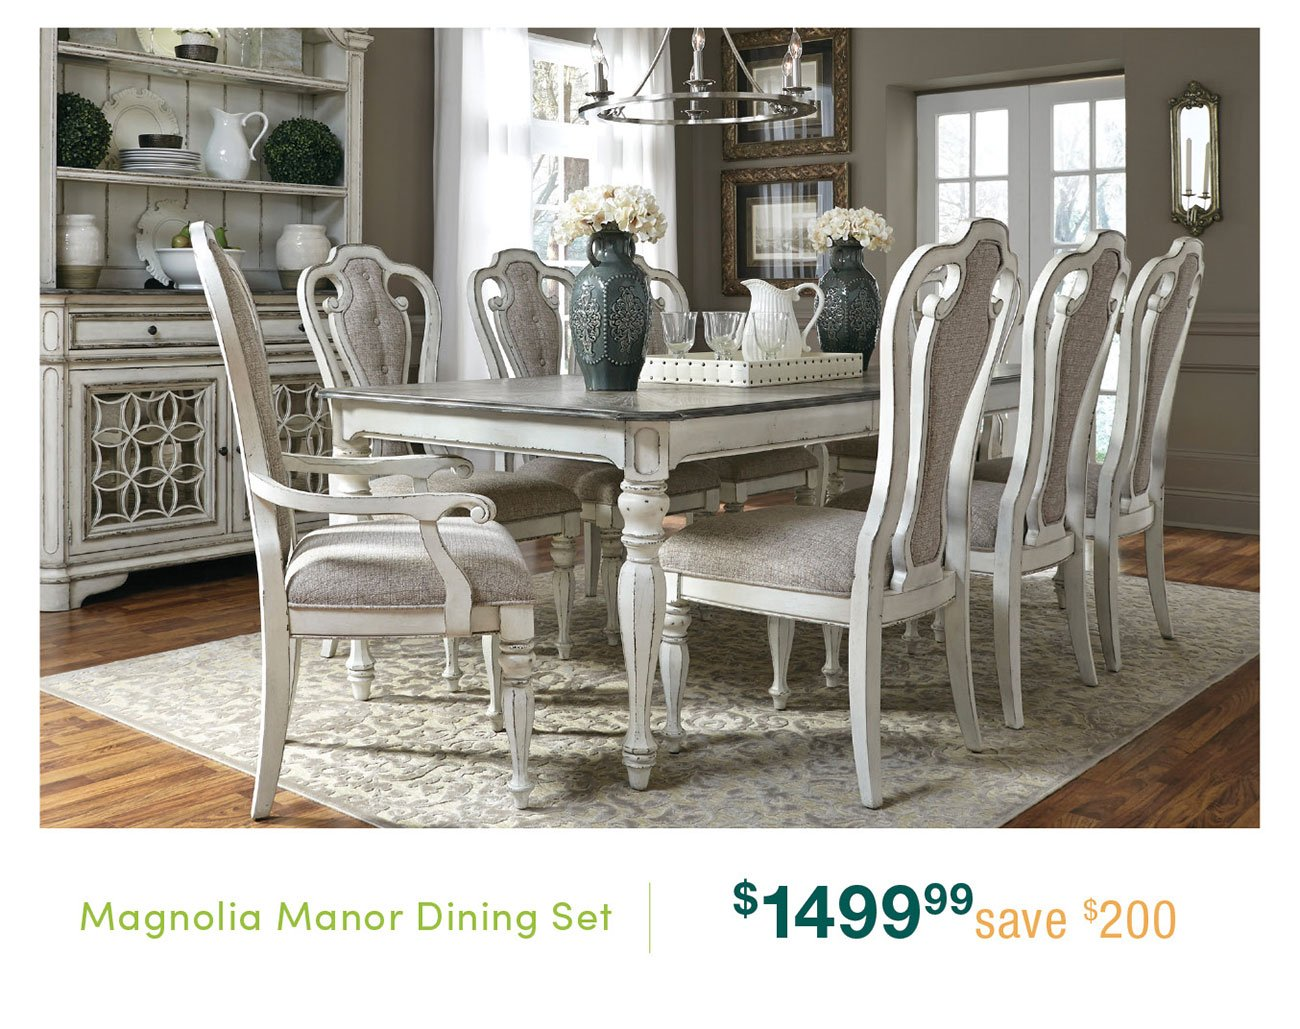 Magnolia-manor-dining-set